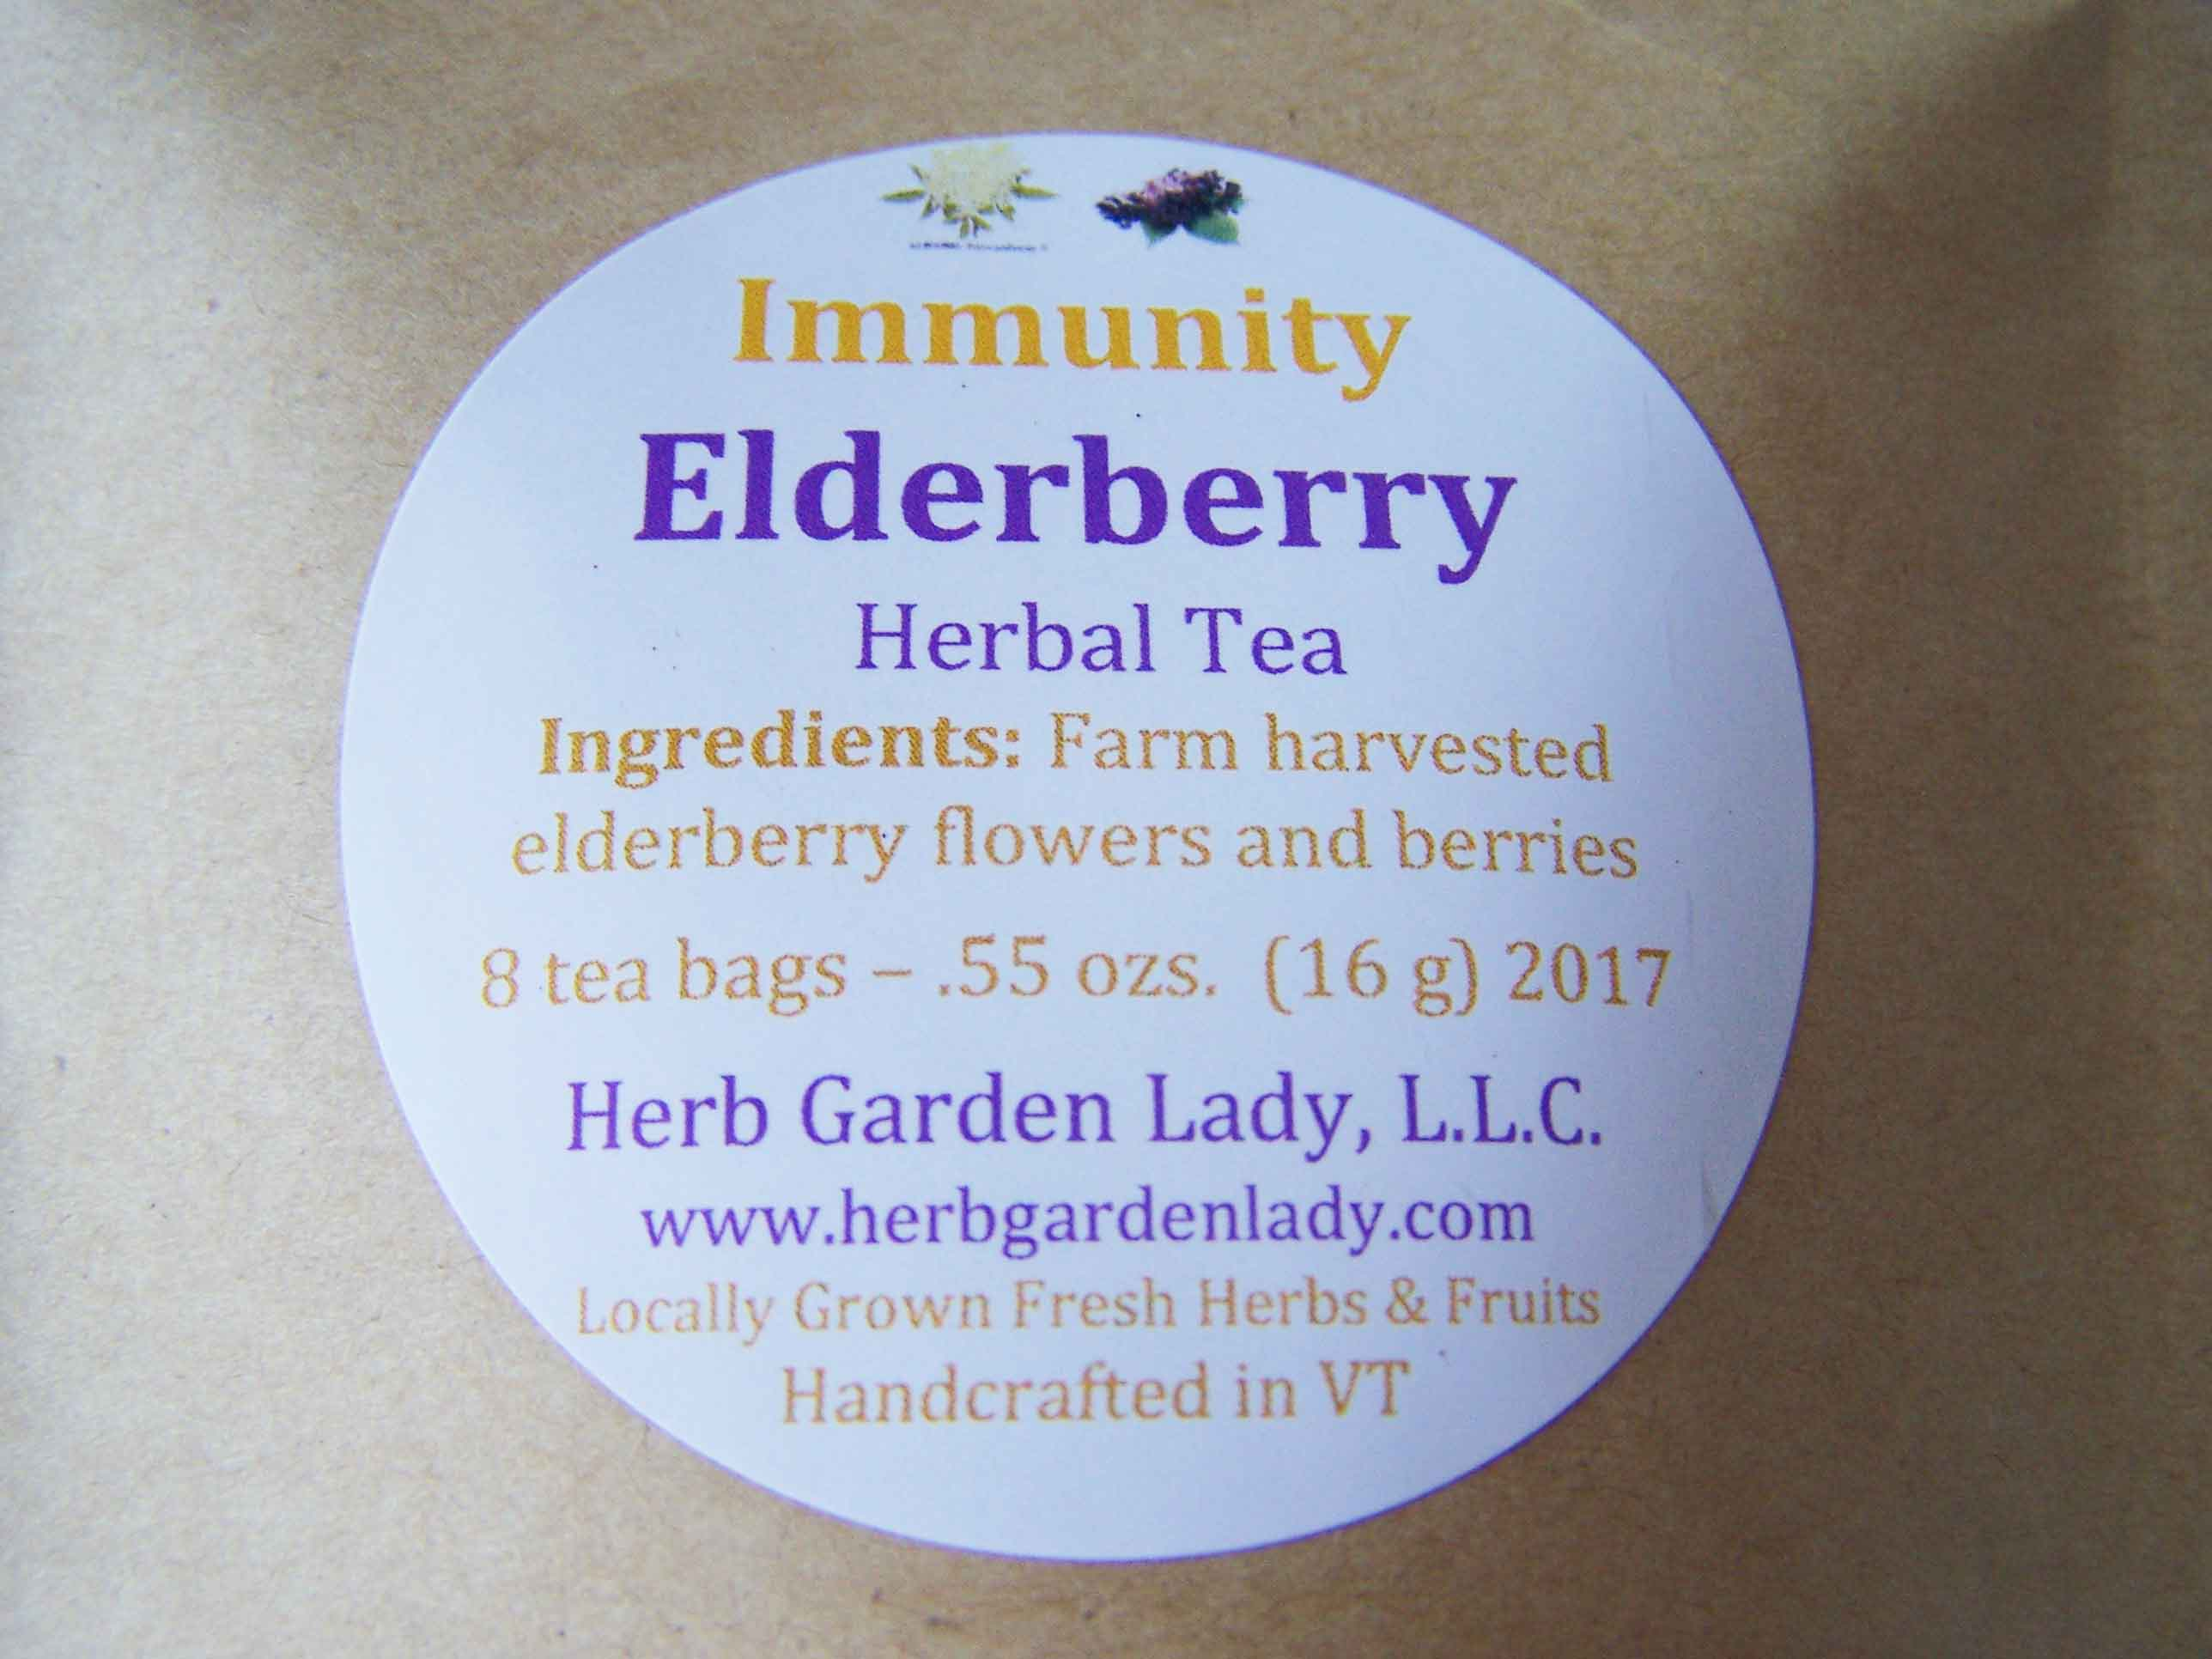 Elderberry tea immunity benefits in a herbal tea.